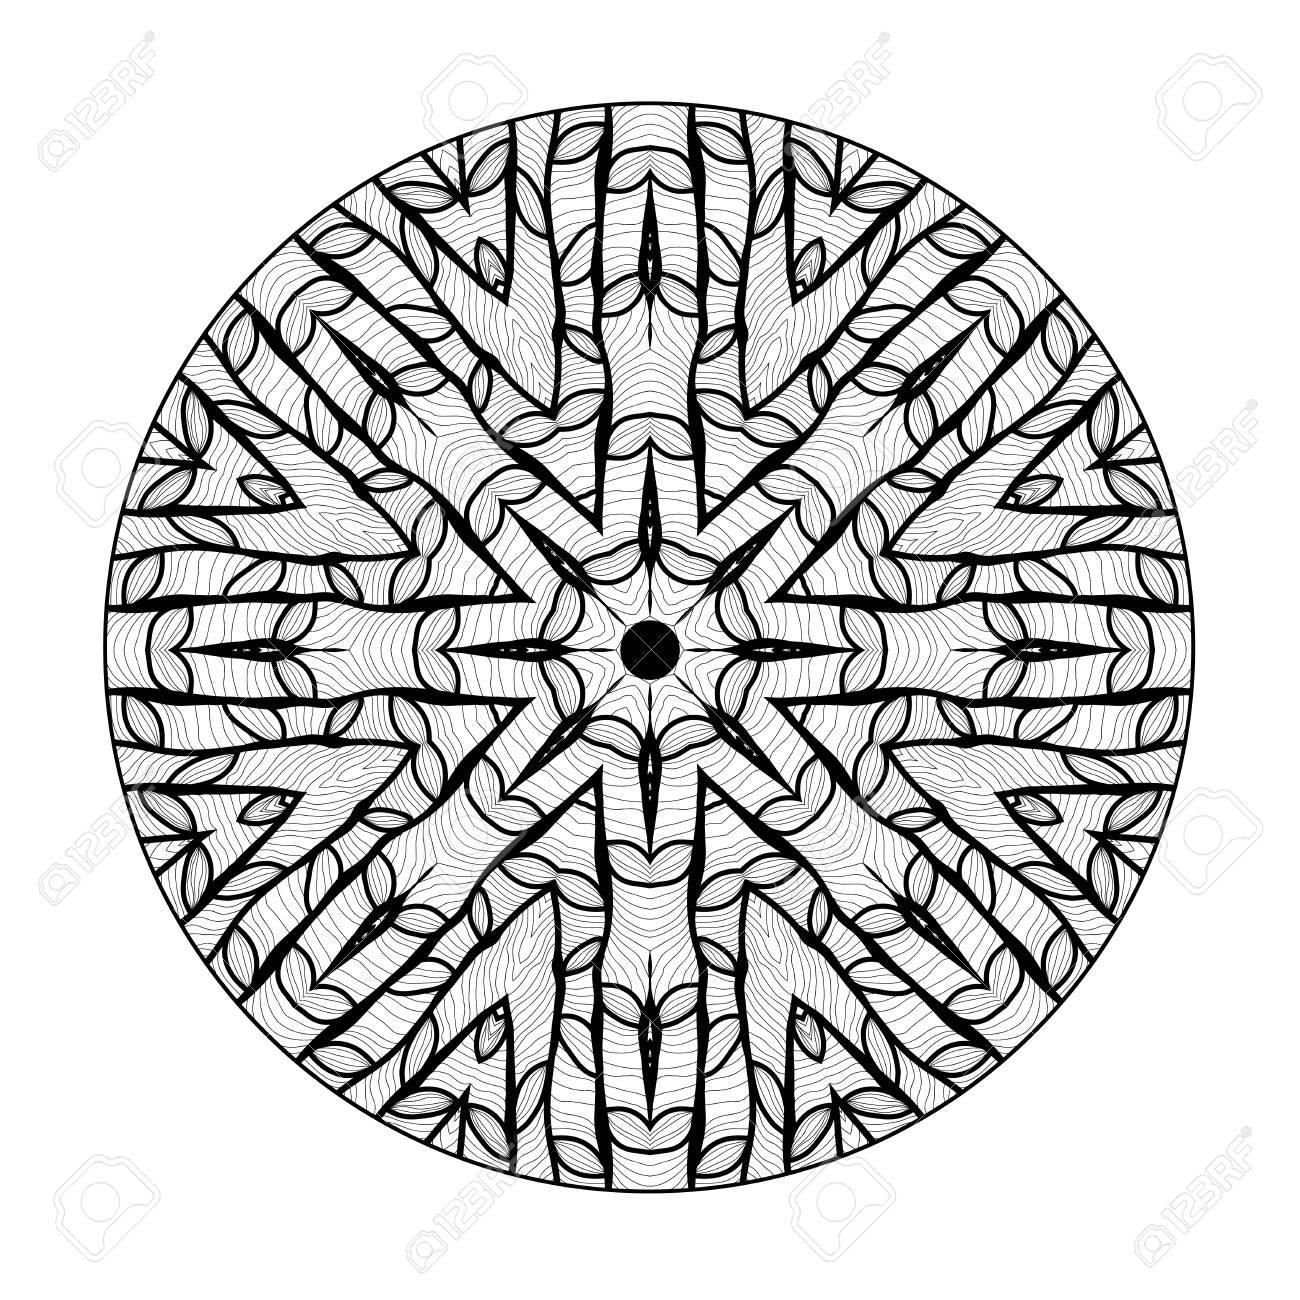 Mandala. Elemento Decorativo Redondo étnico. Dibujado A Mano Patrón ...